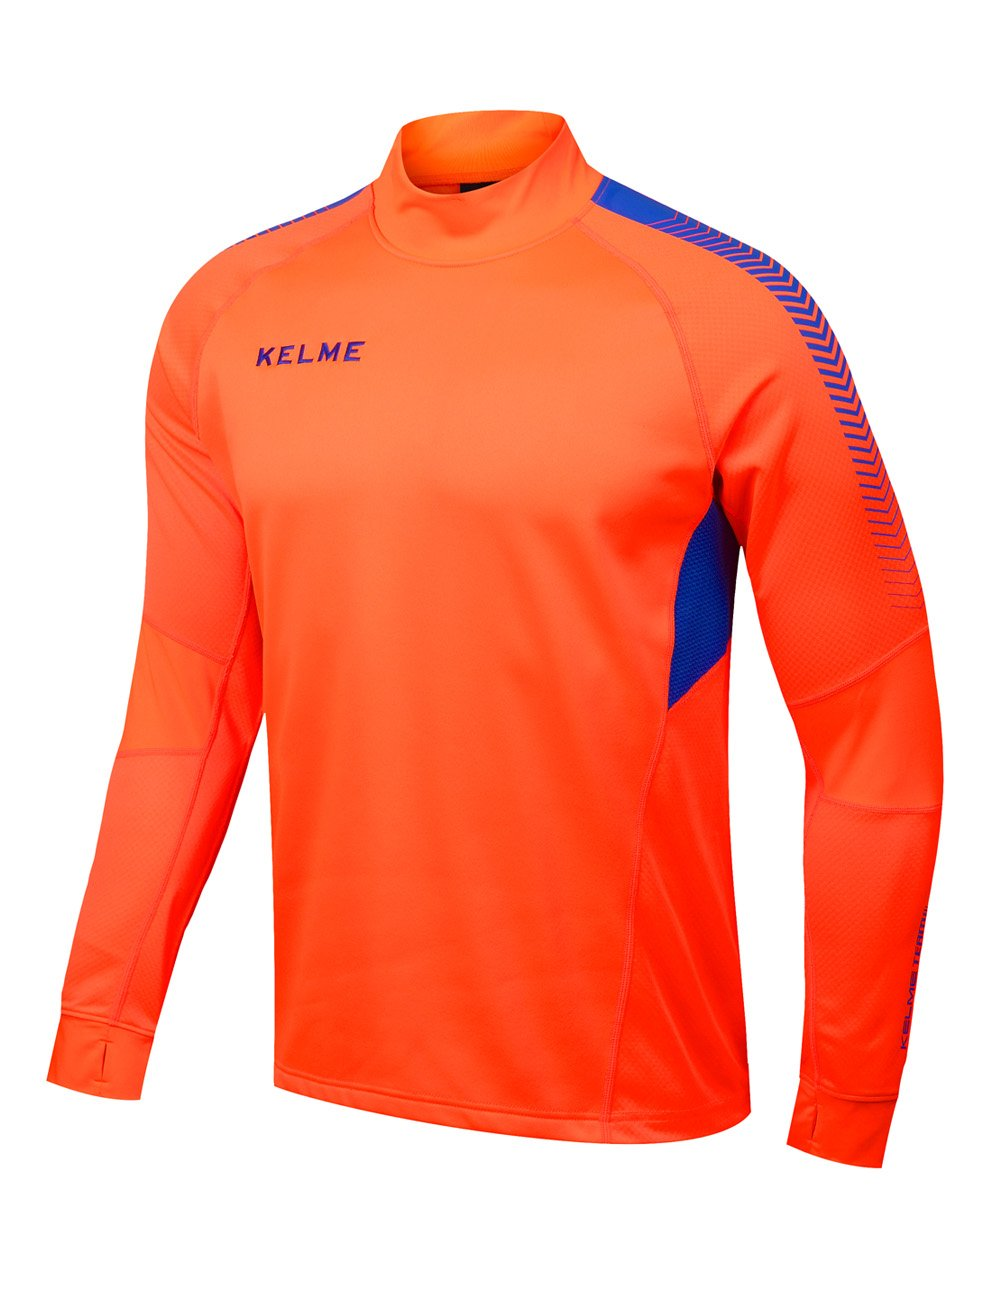 KELME Sweatshirt Team Player Functional Sudadera de fútbol: Amazon ...